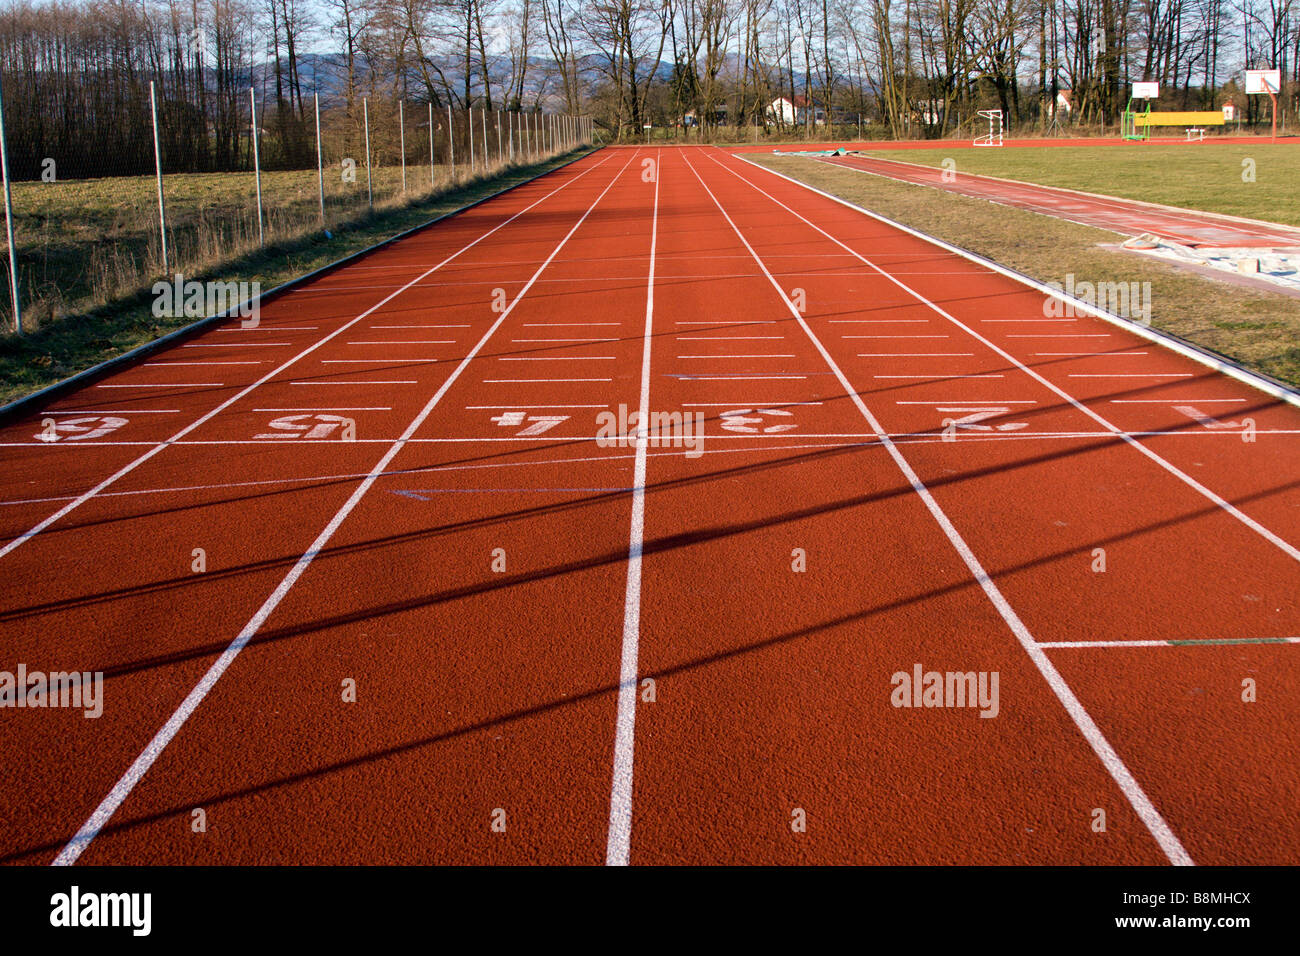 Lane números de pista de atletismo Imagen De Stock